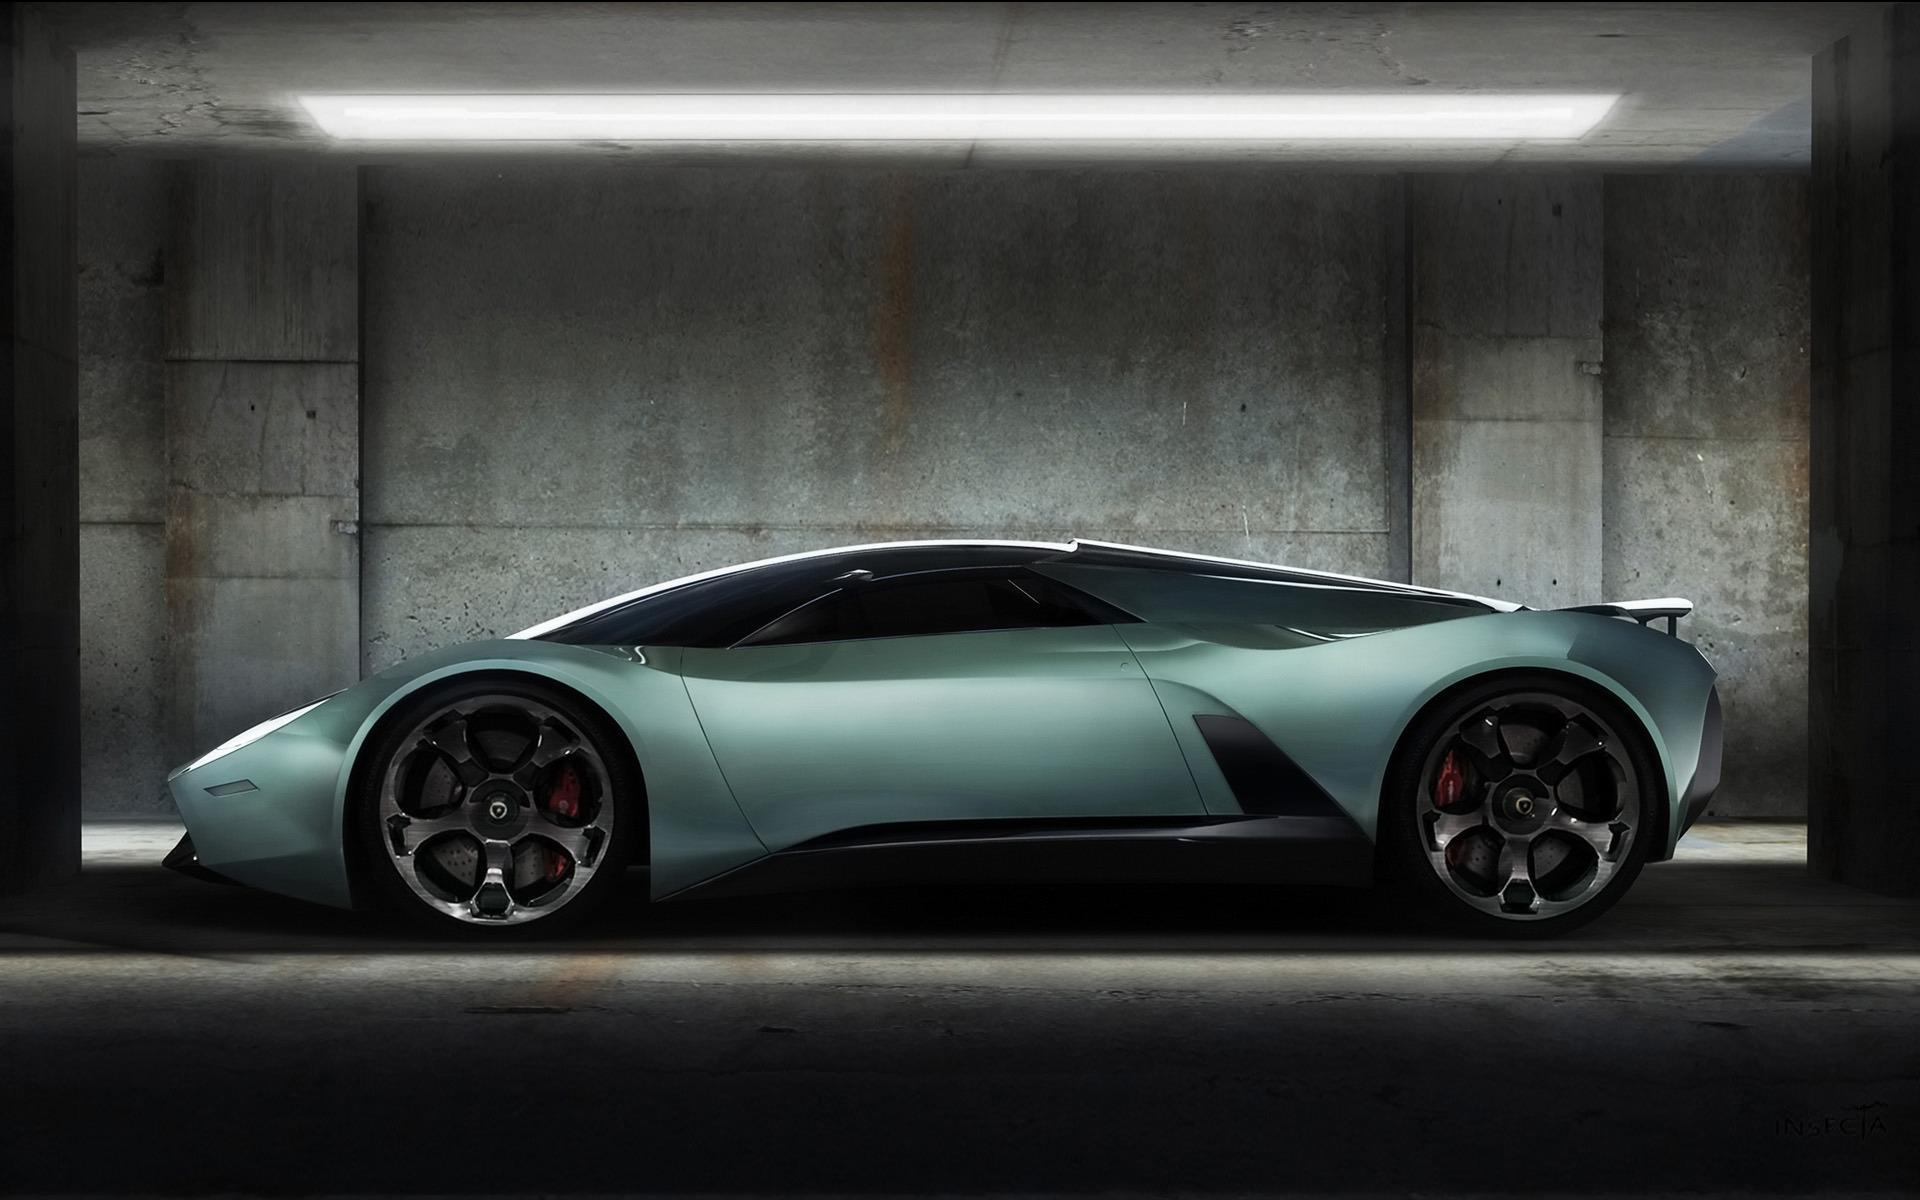 50 Super Sports Car Wallpapers Thatll Blow Your Desktop Away